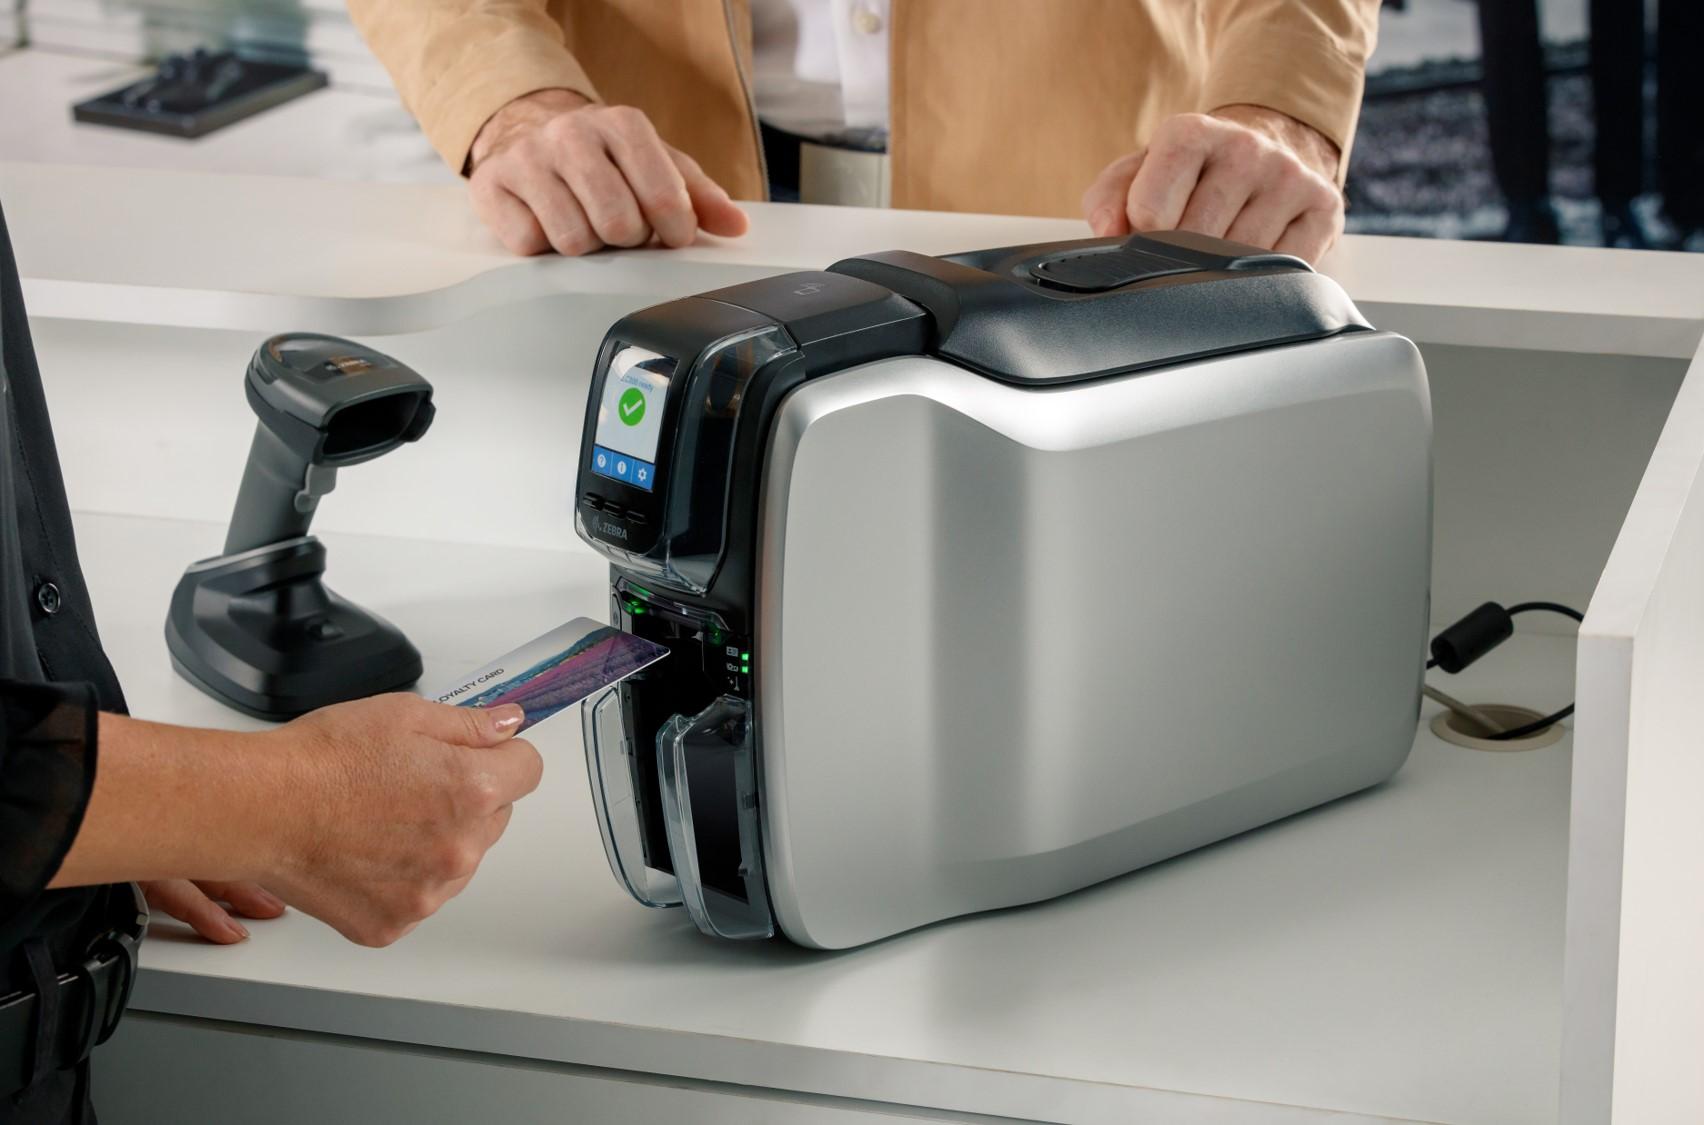 impresora Zebra ZC100